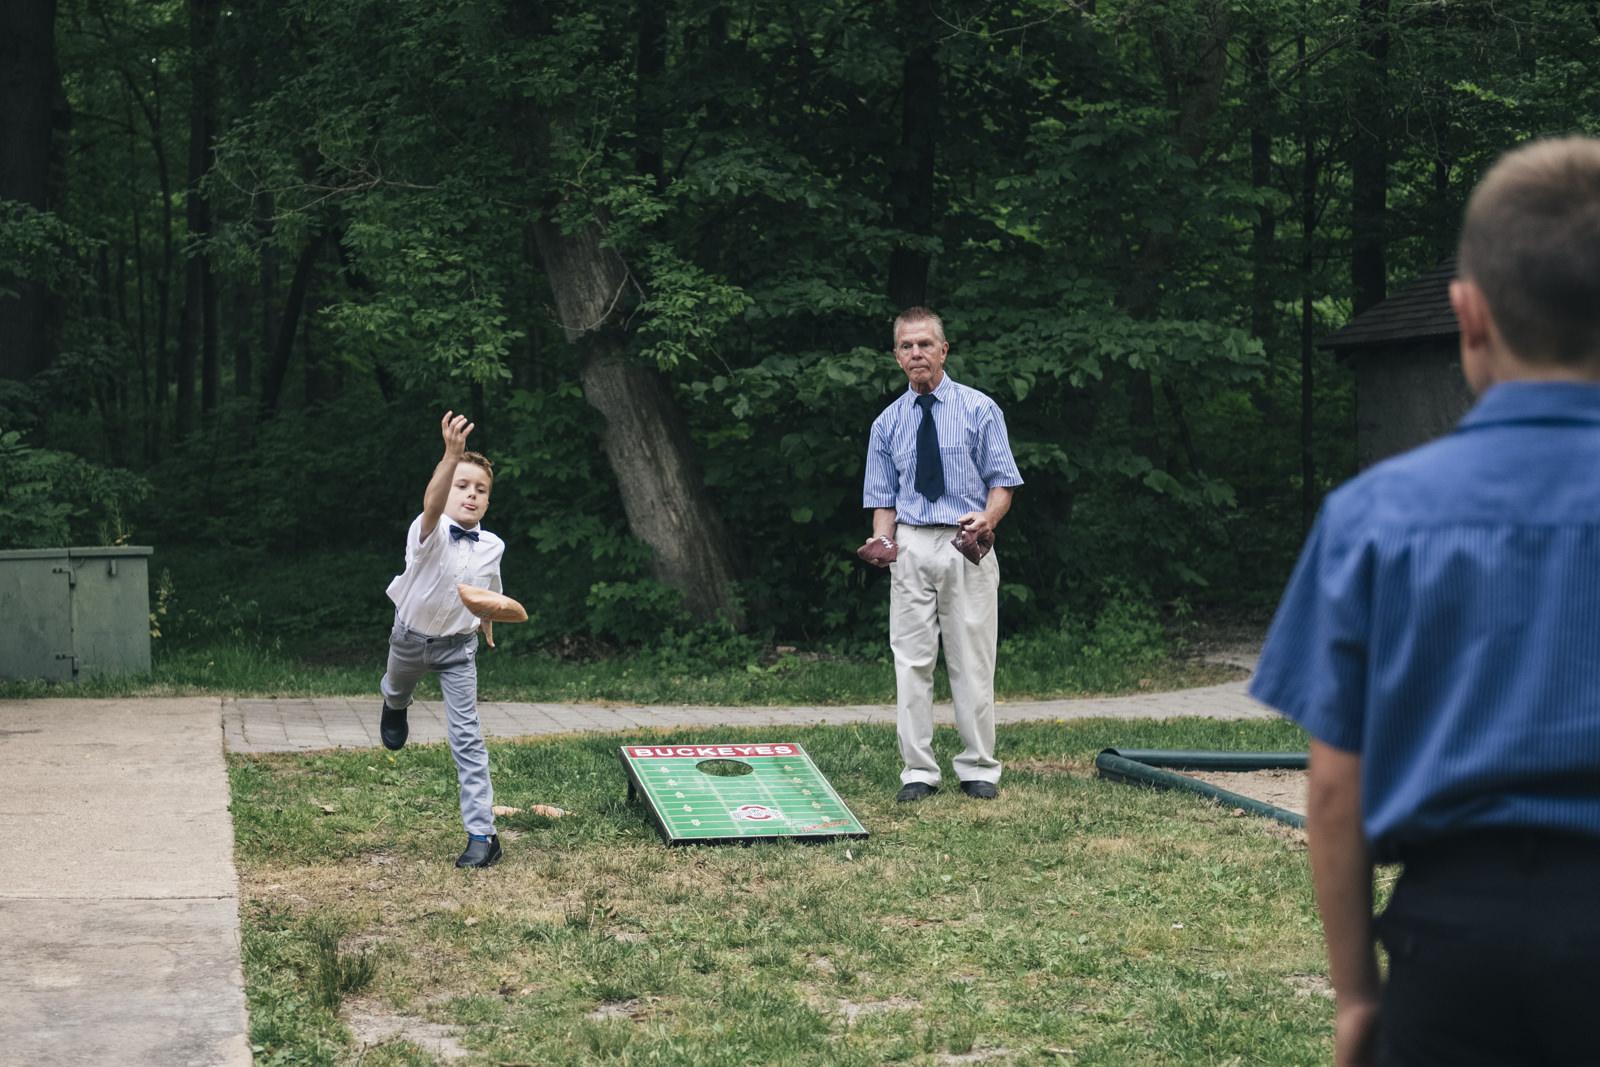 Ohio outdoor wedding receptions always include cornhole!